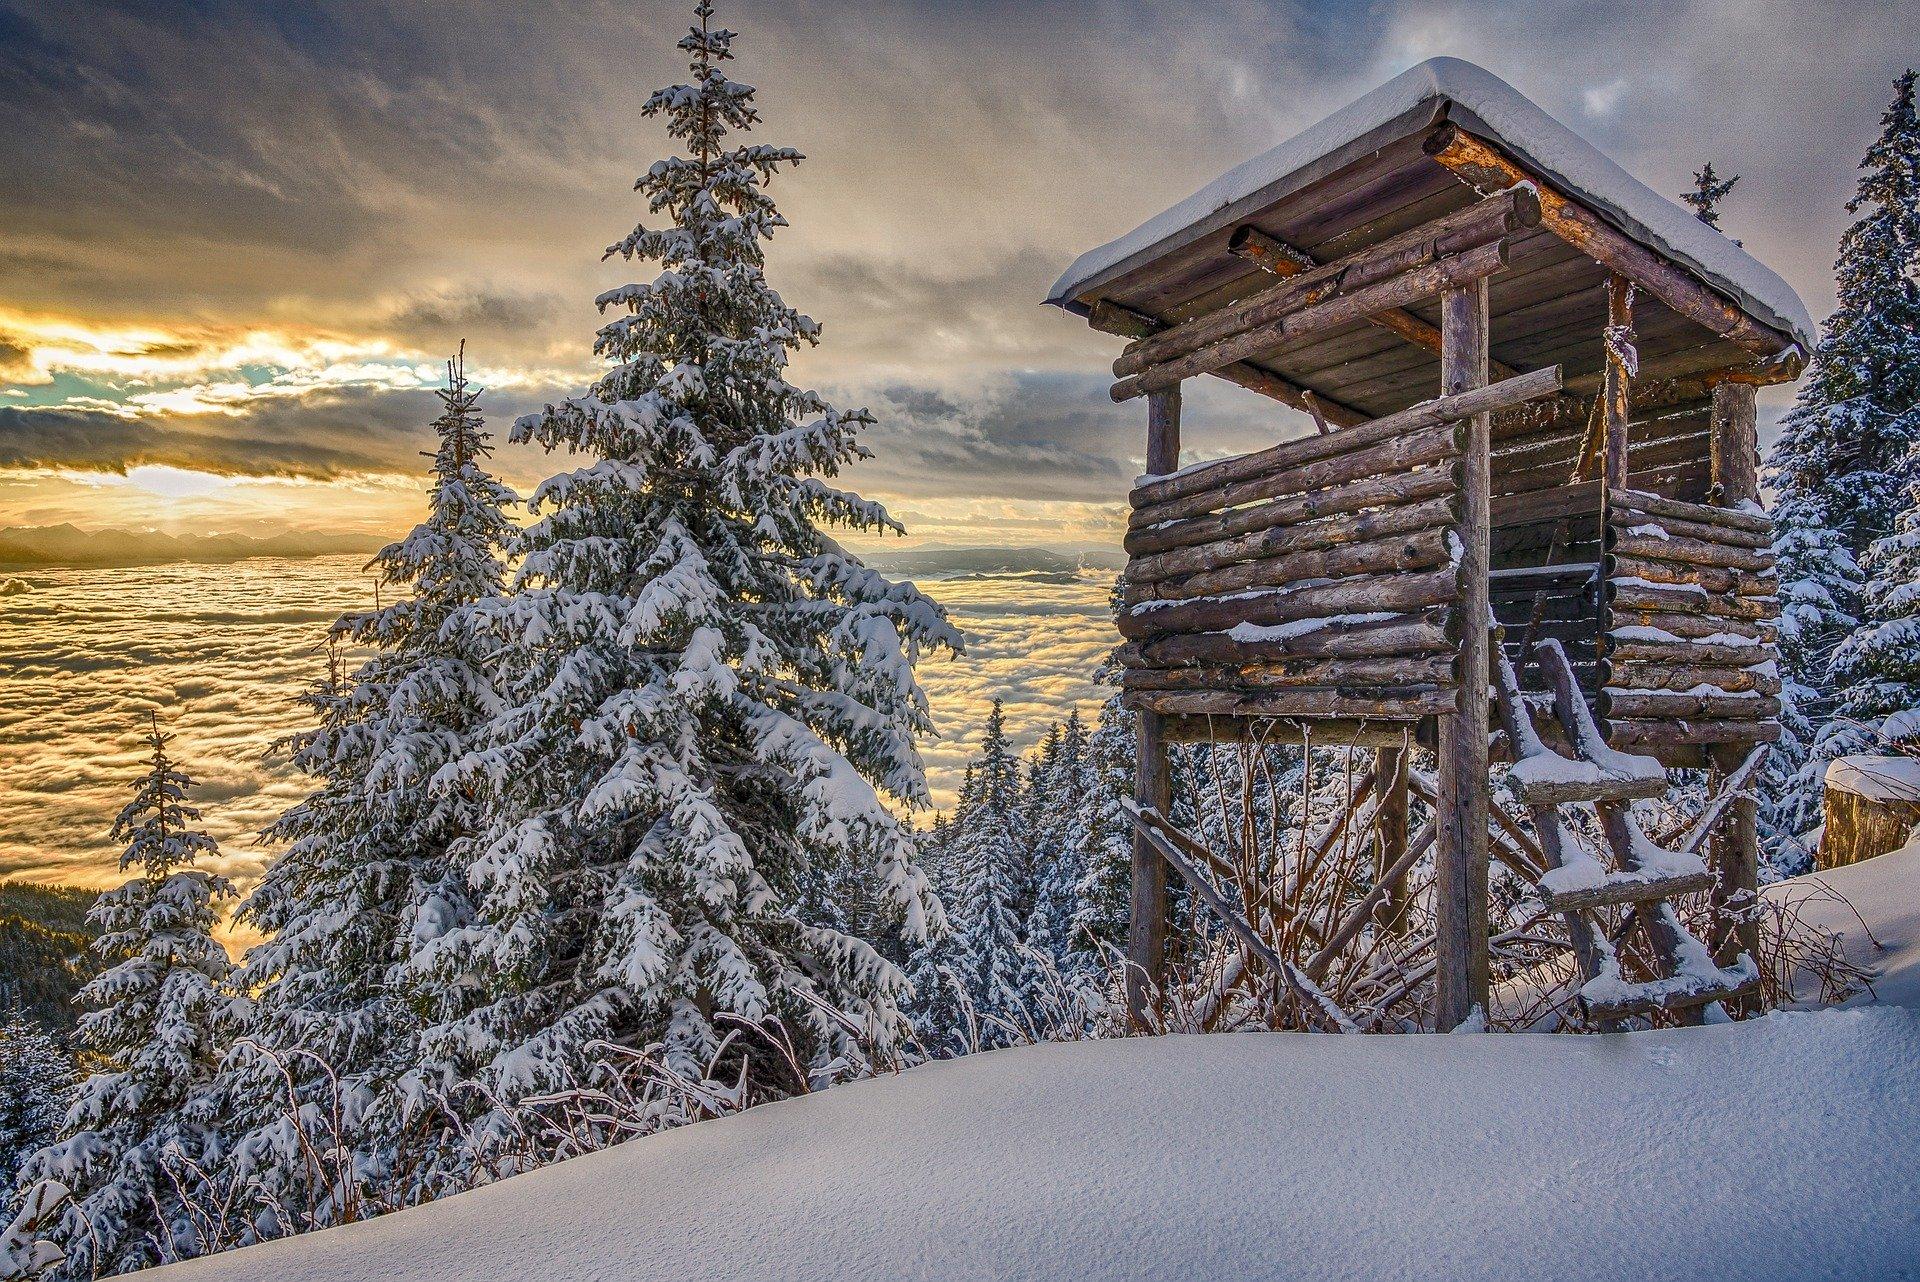 heizveste winter